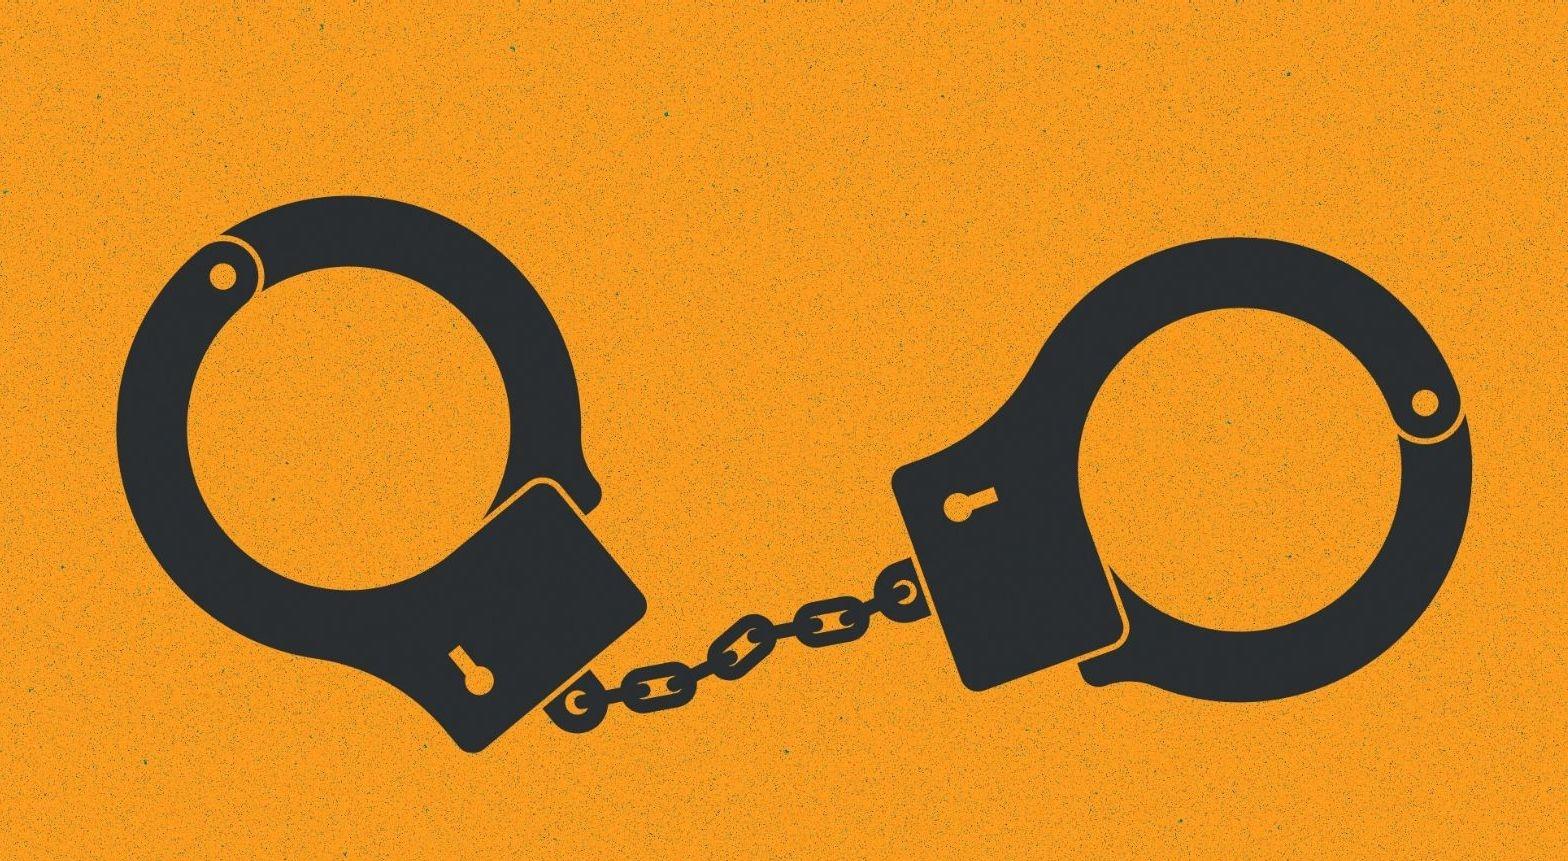 Man Arrested for 'Spreading Communal Hatred' on Social Media